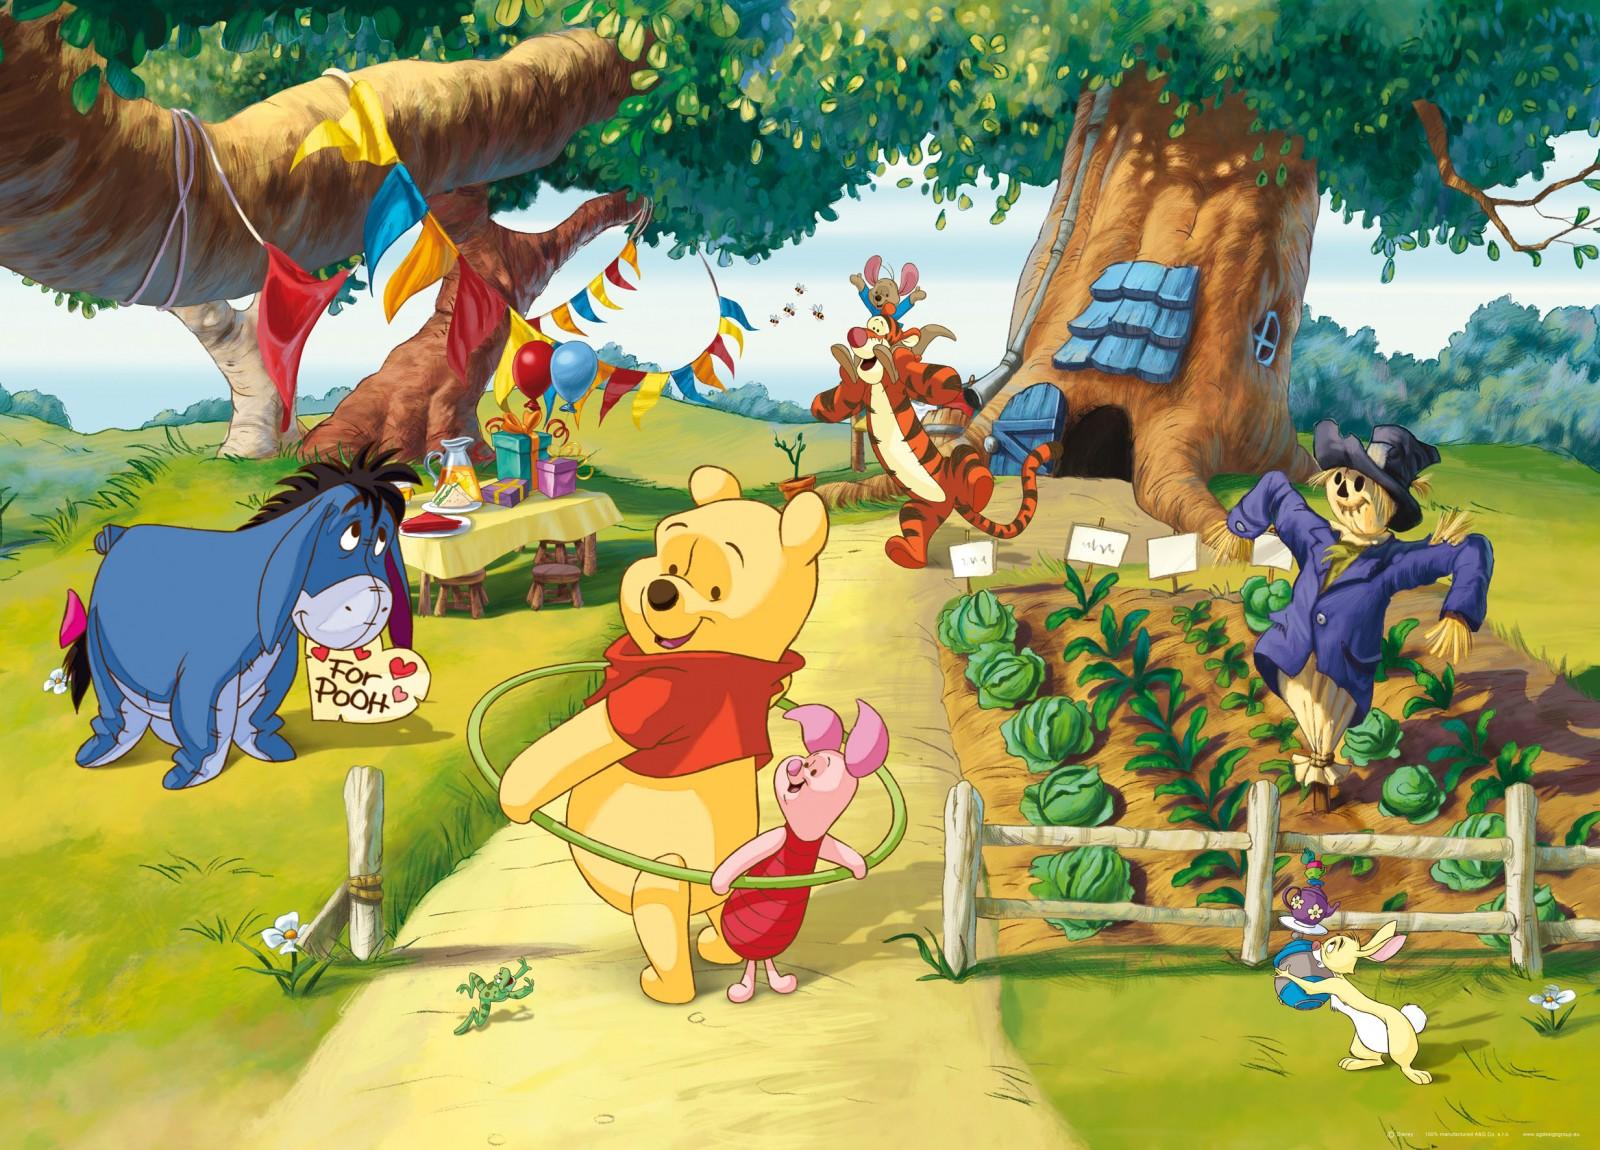 Disney Poster Tapete Winnie Puuh Ferkel 160x115cm